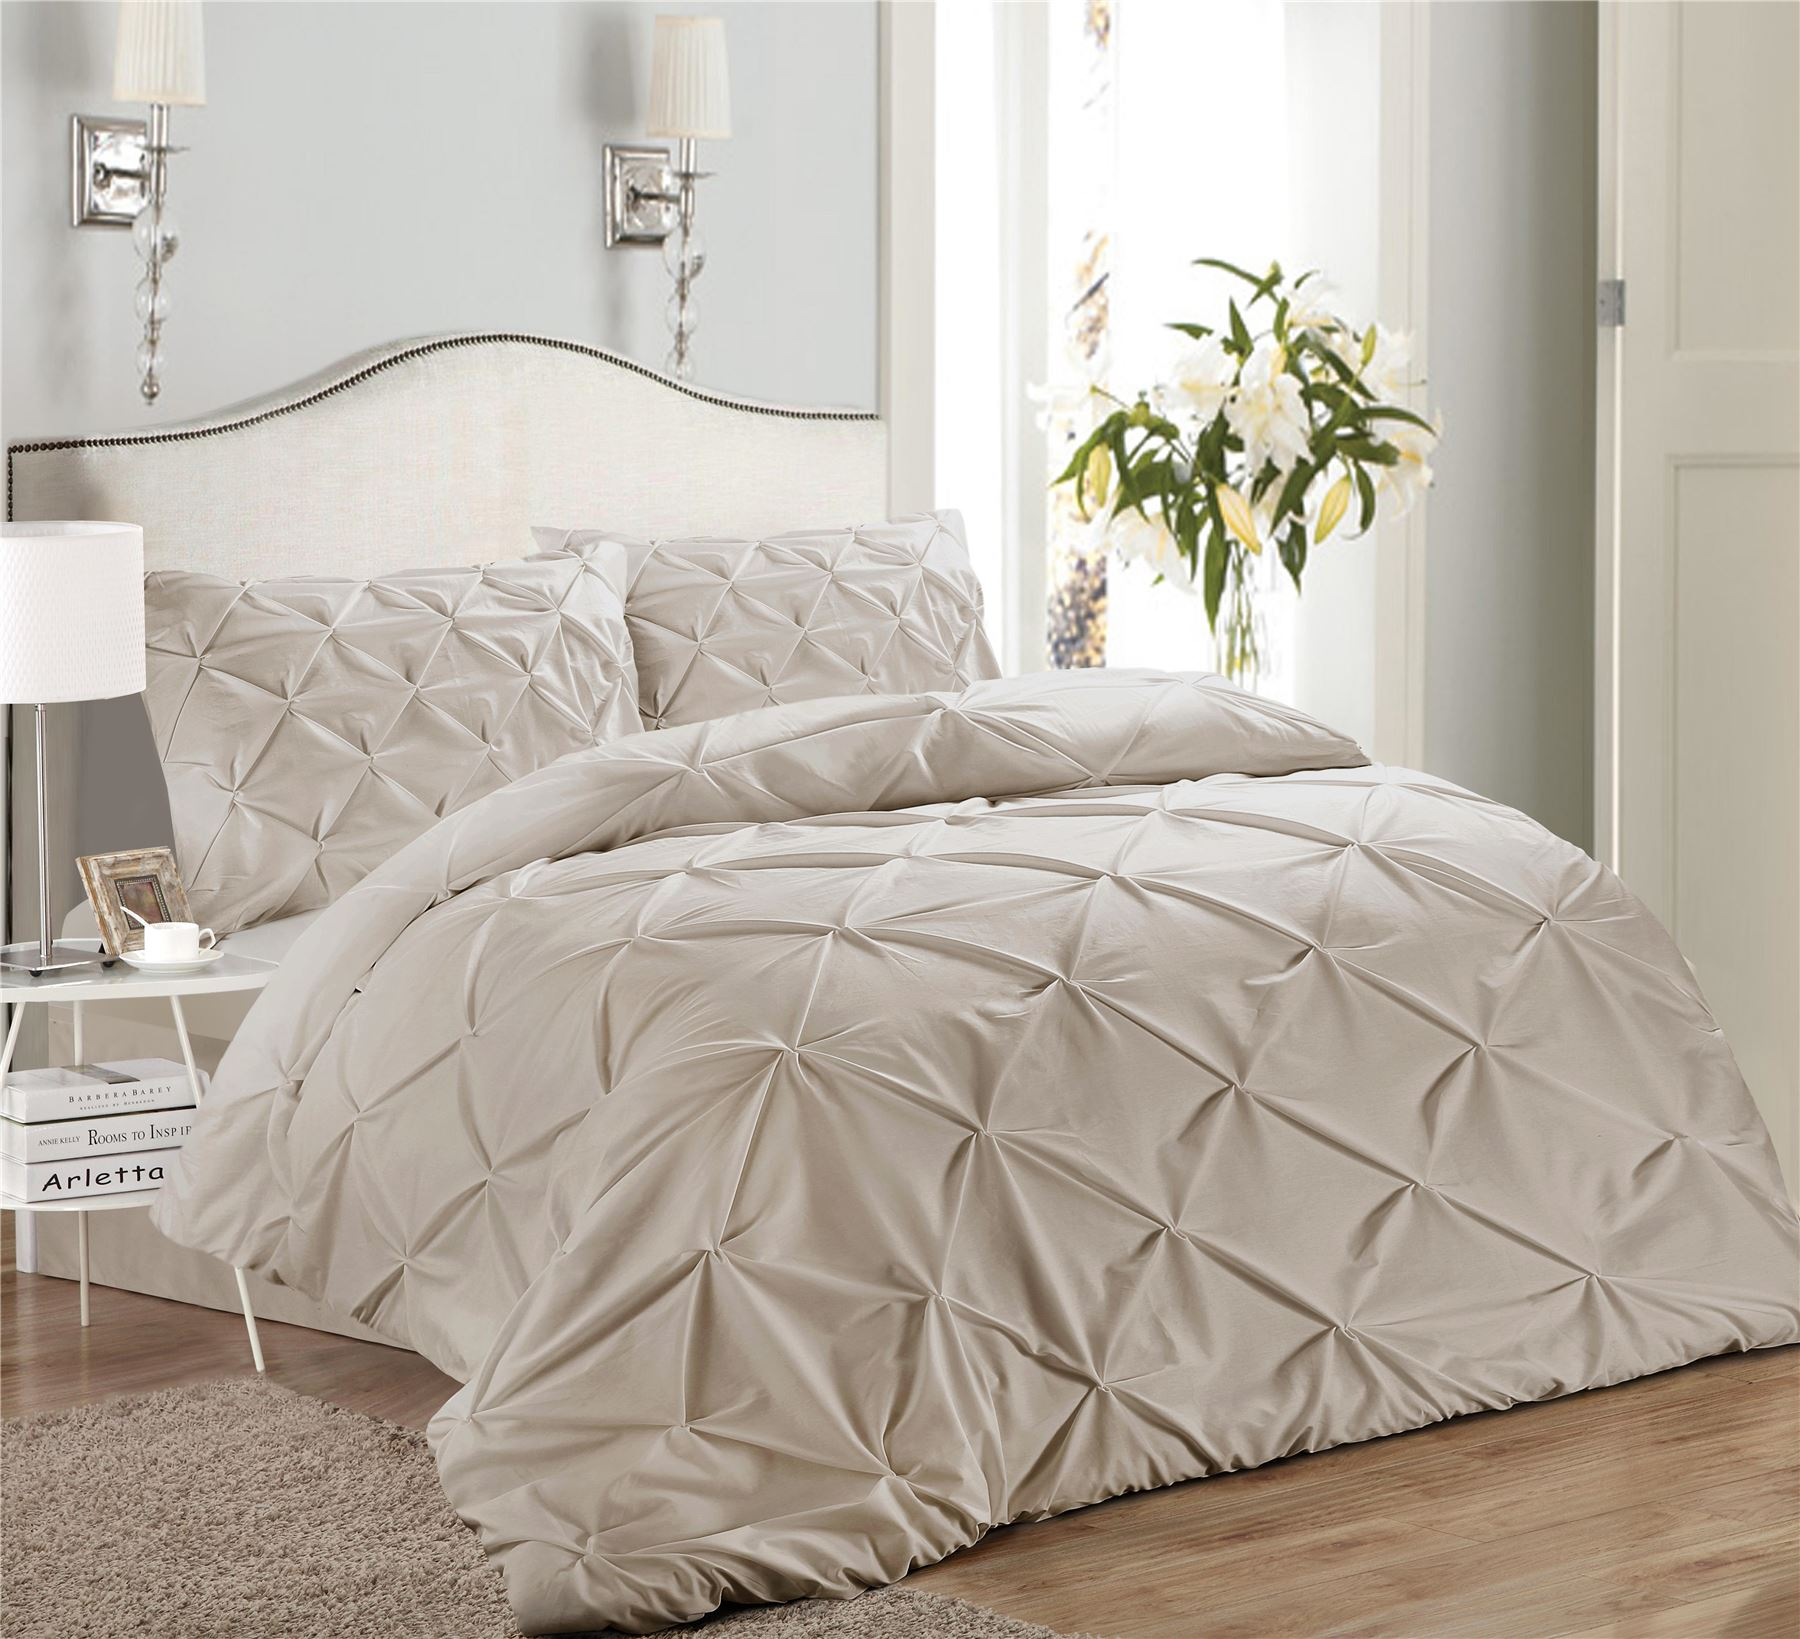 Luxury-Pure-100-Cotton-200-Thread-Pinch-Pleat-Pintuck-Puckering-Duvet-Cover-Set thumbnail 55